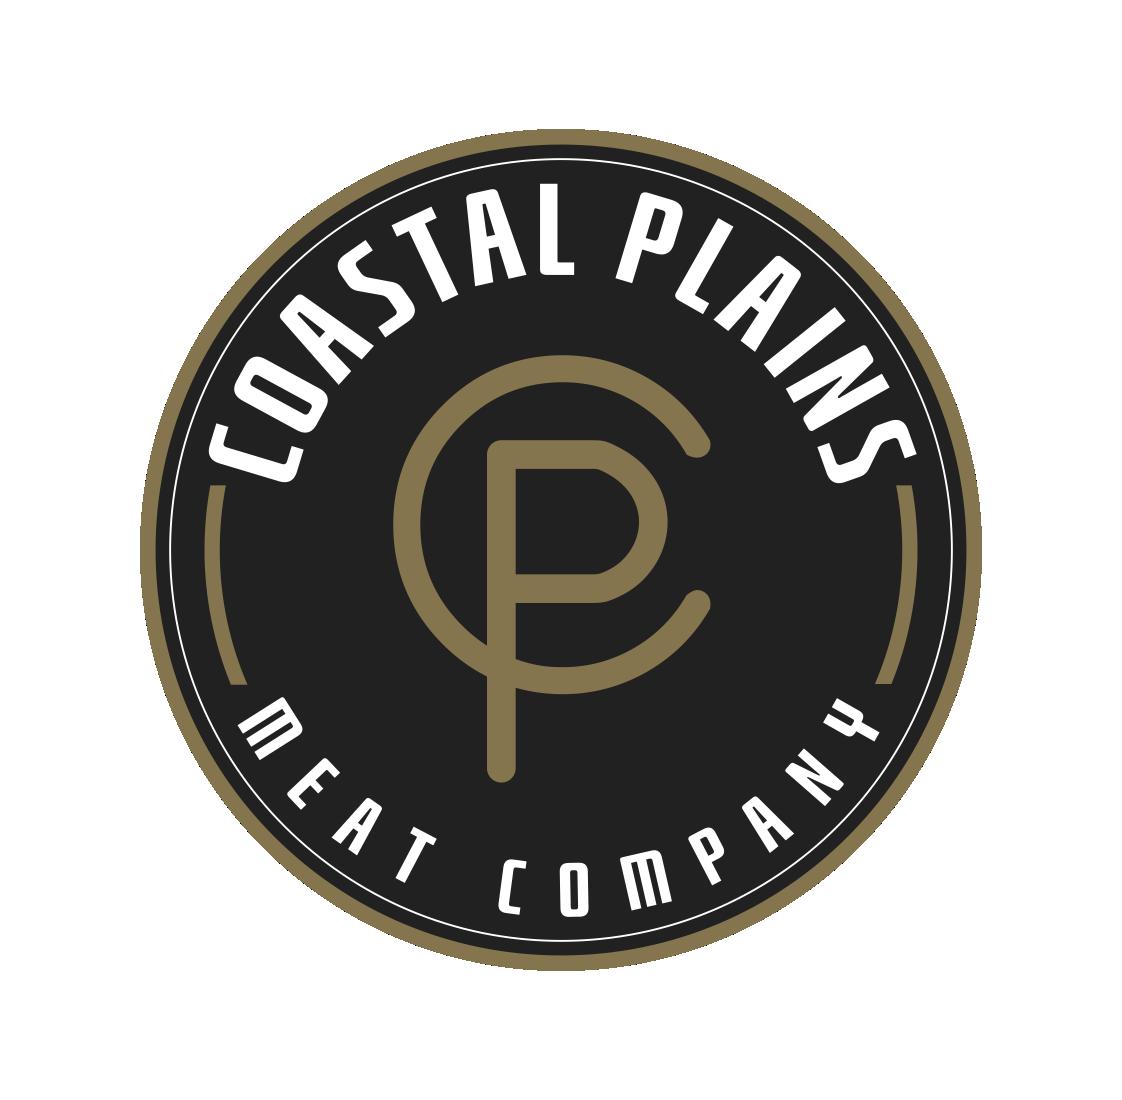 CPMC | Coastal Plains Meat Company